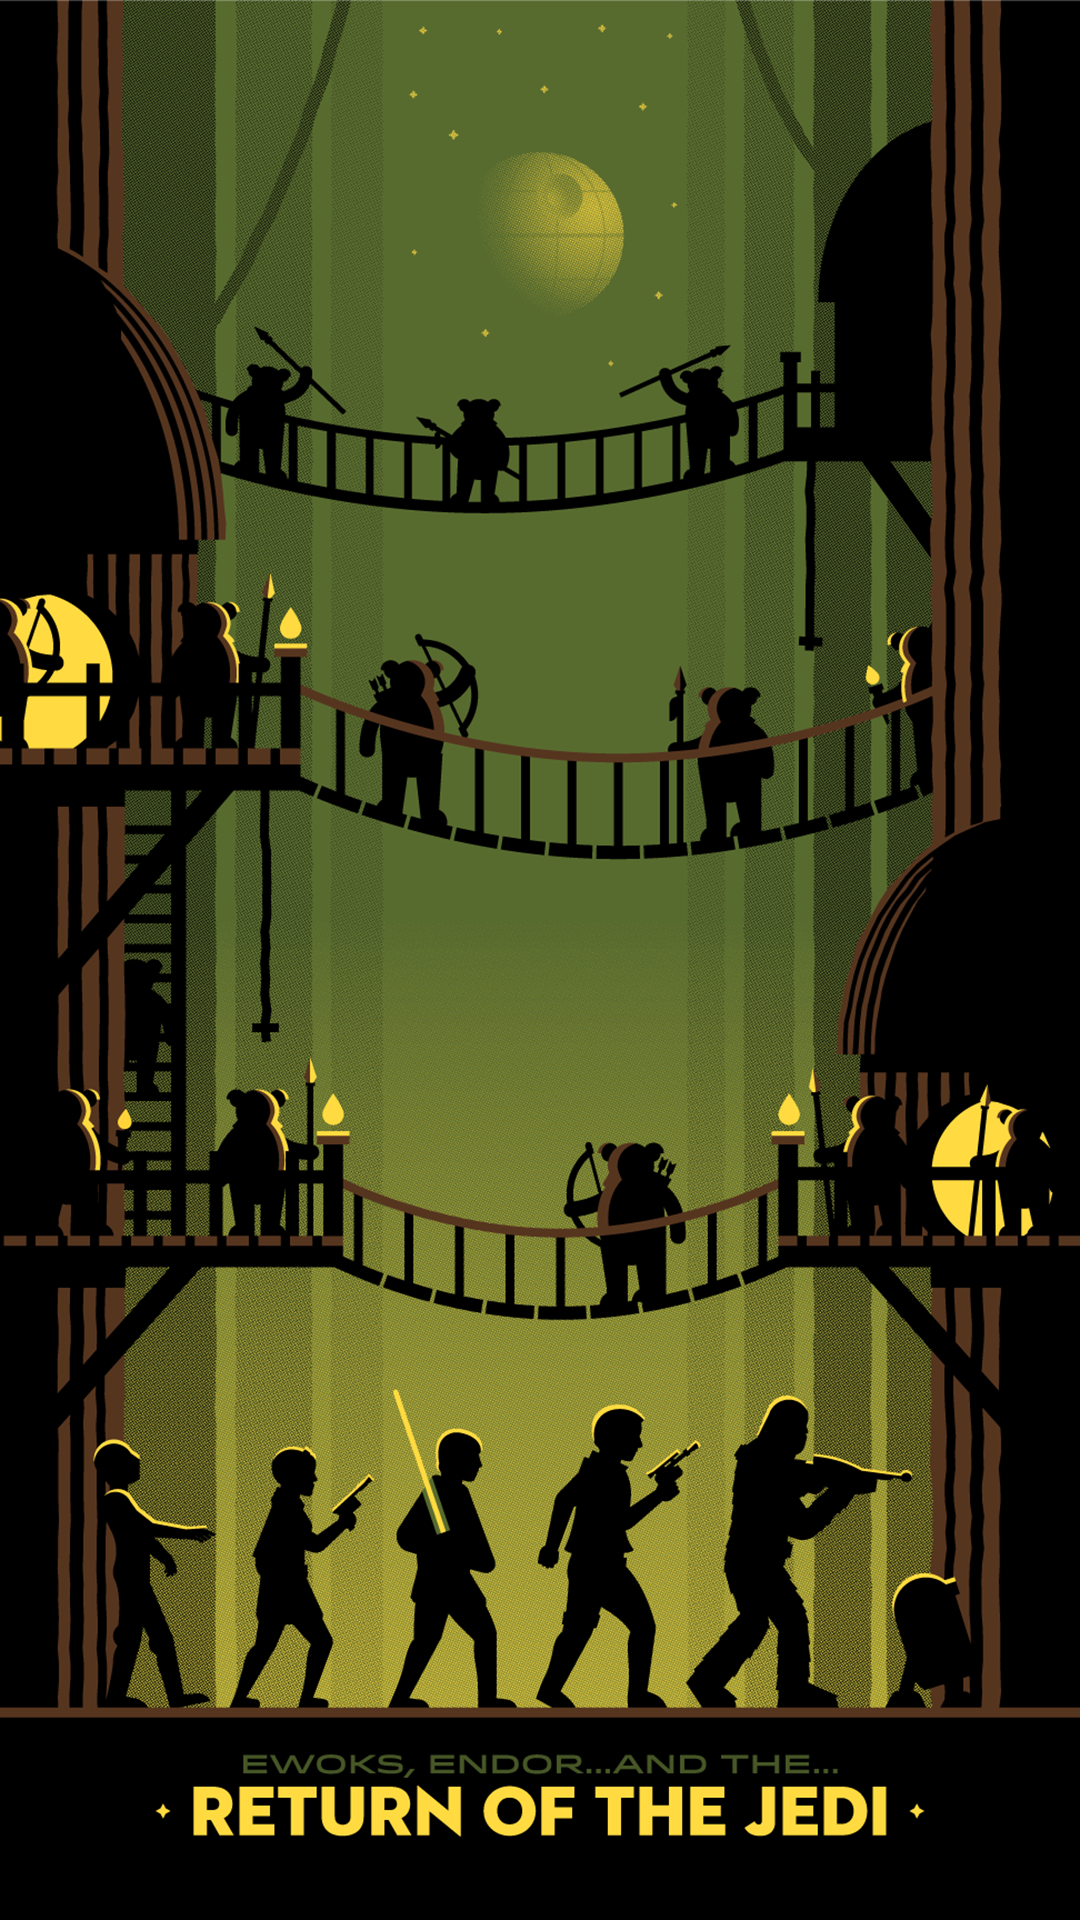 Star Wars Endor Wallpaper 4k